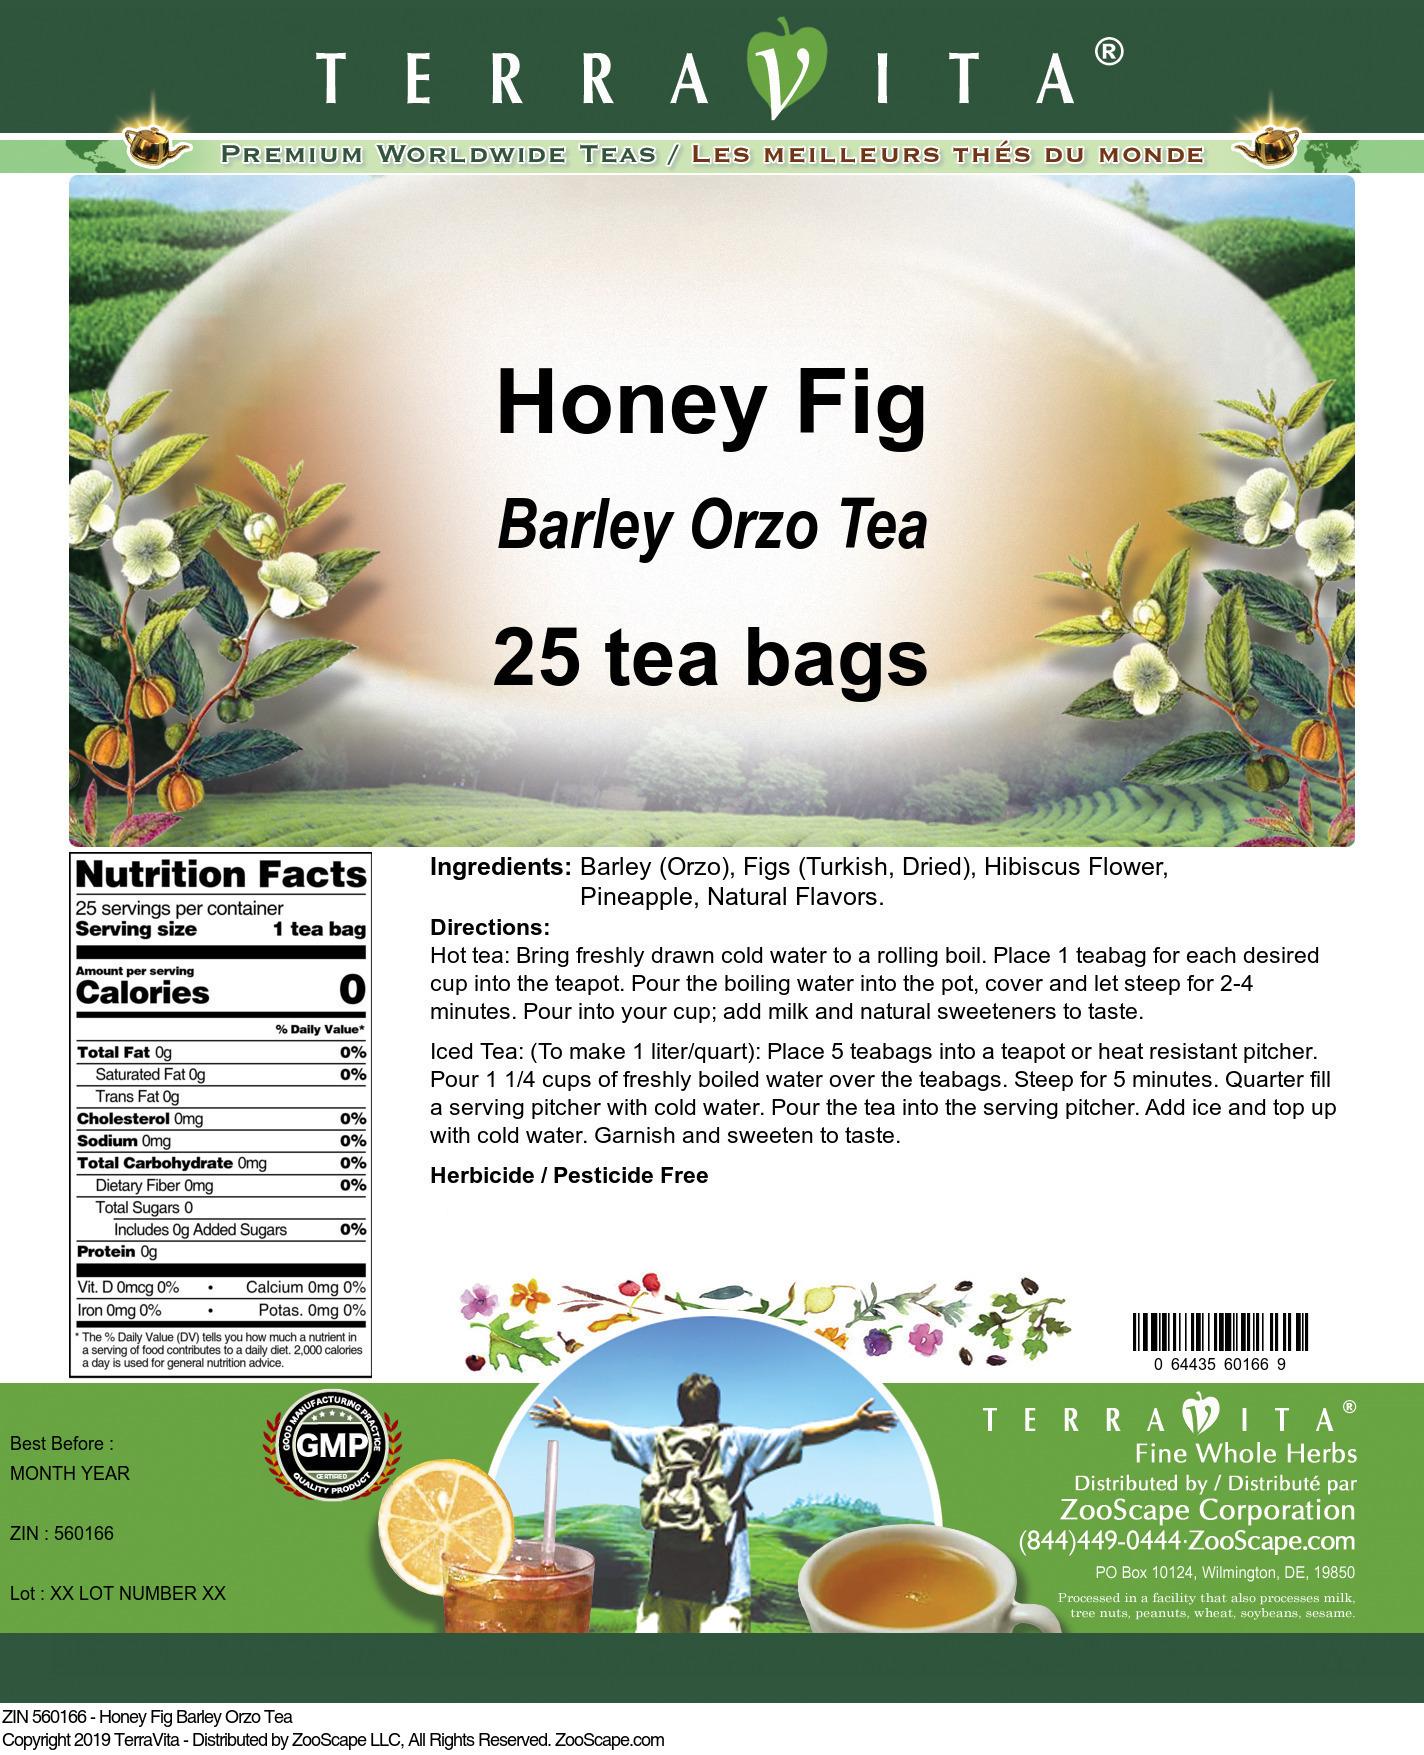 Honey Fig Barley Orzo